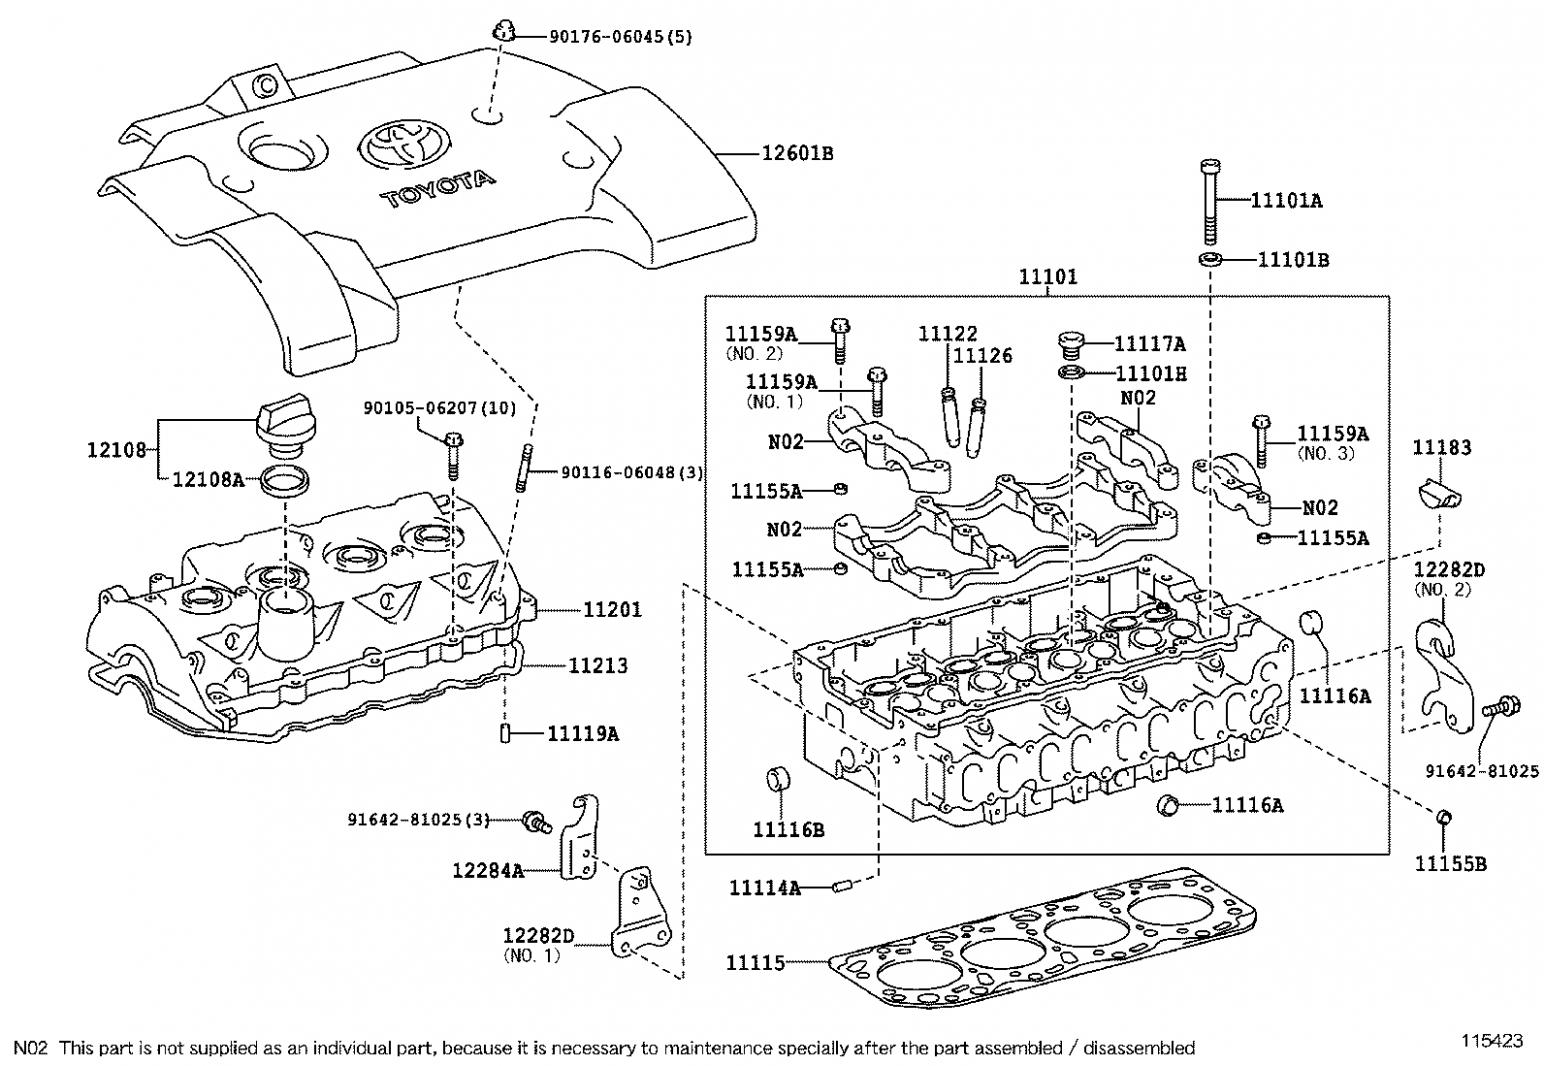 Wiring Diagram Toyota Verso